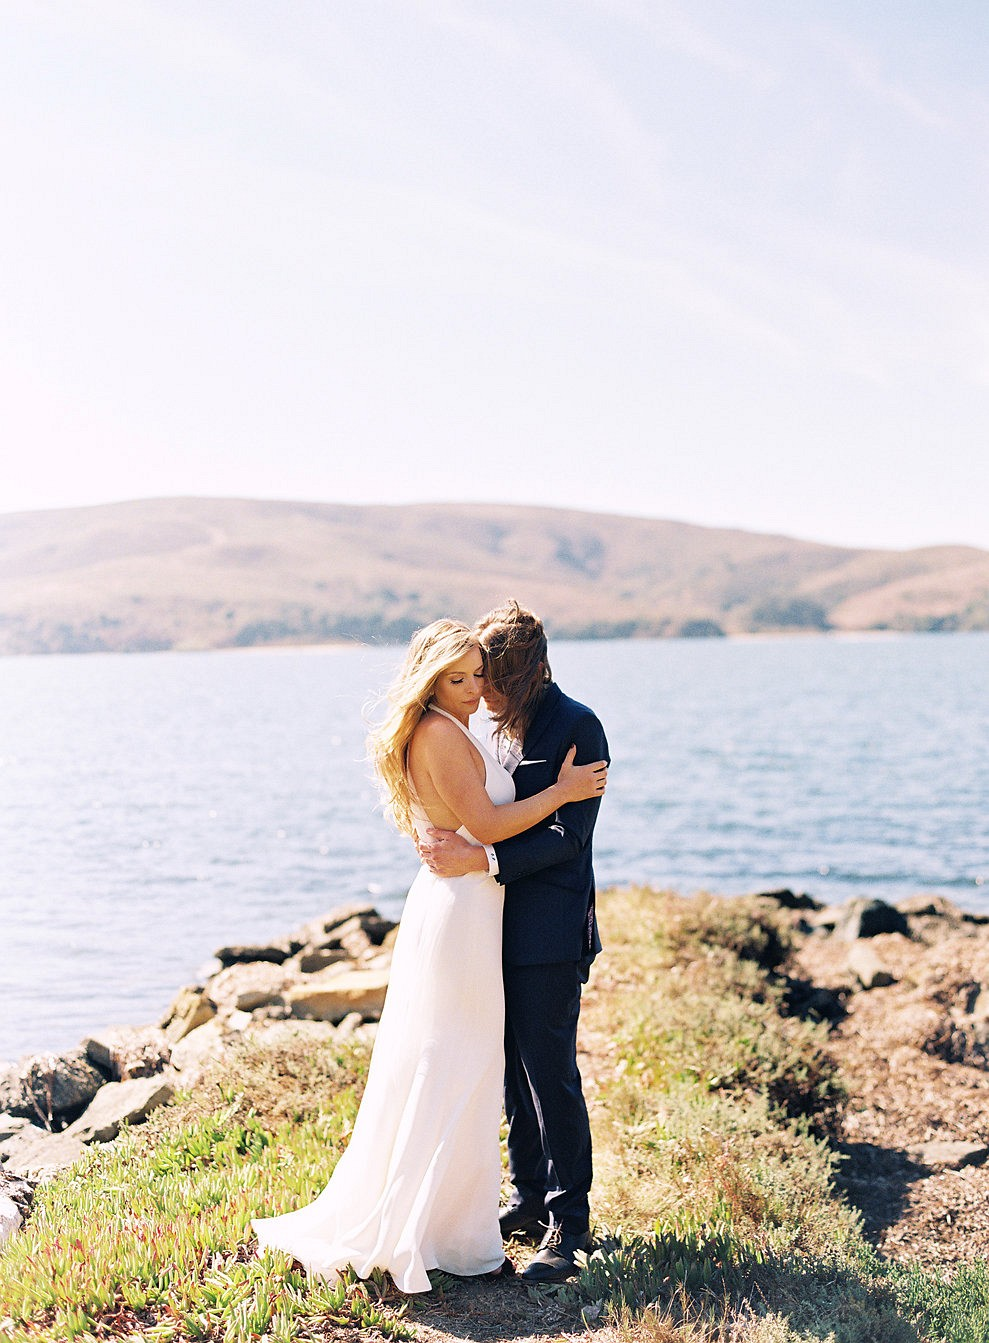 Lauren and Chris' Laid Back Outdoor Wedding